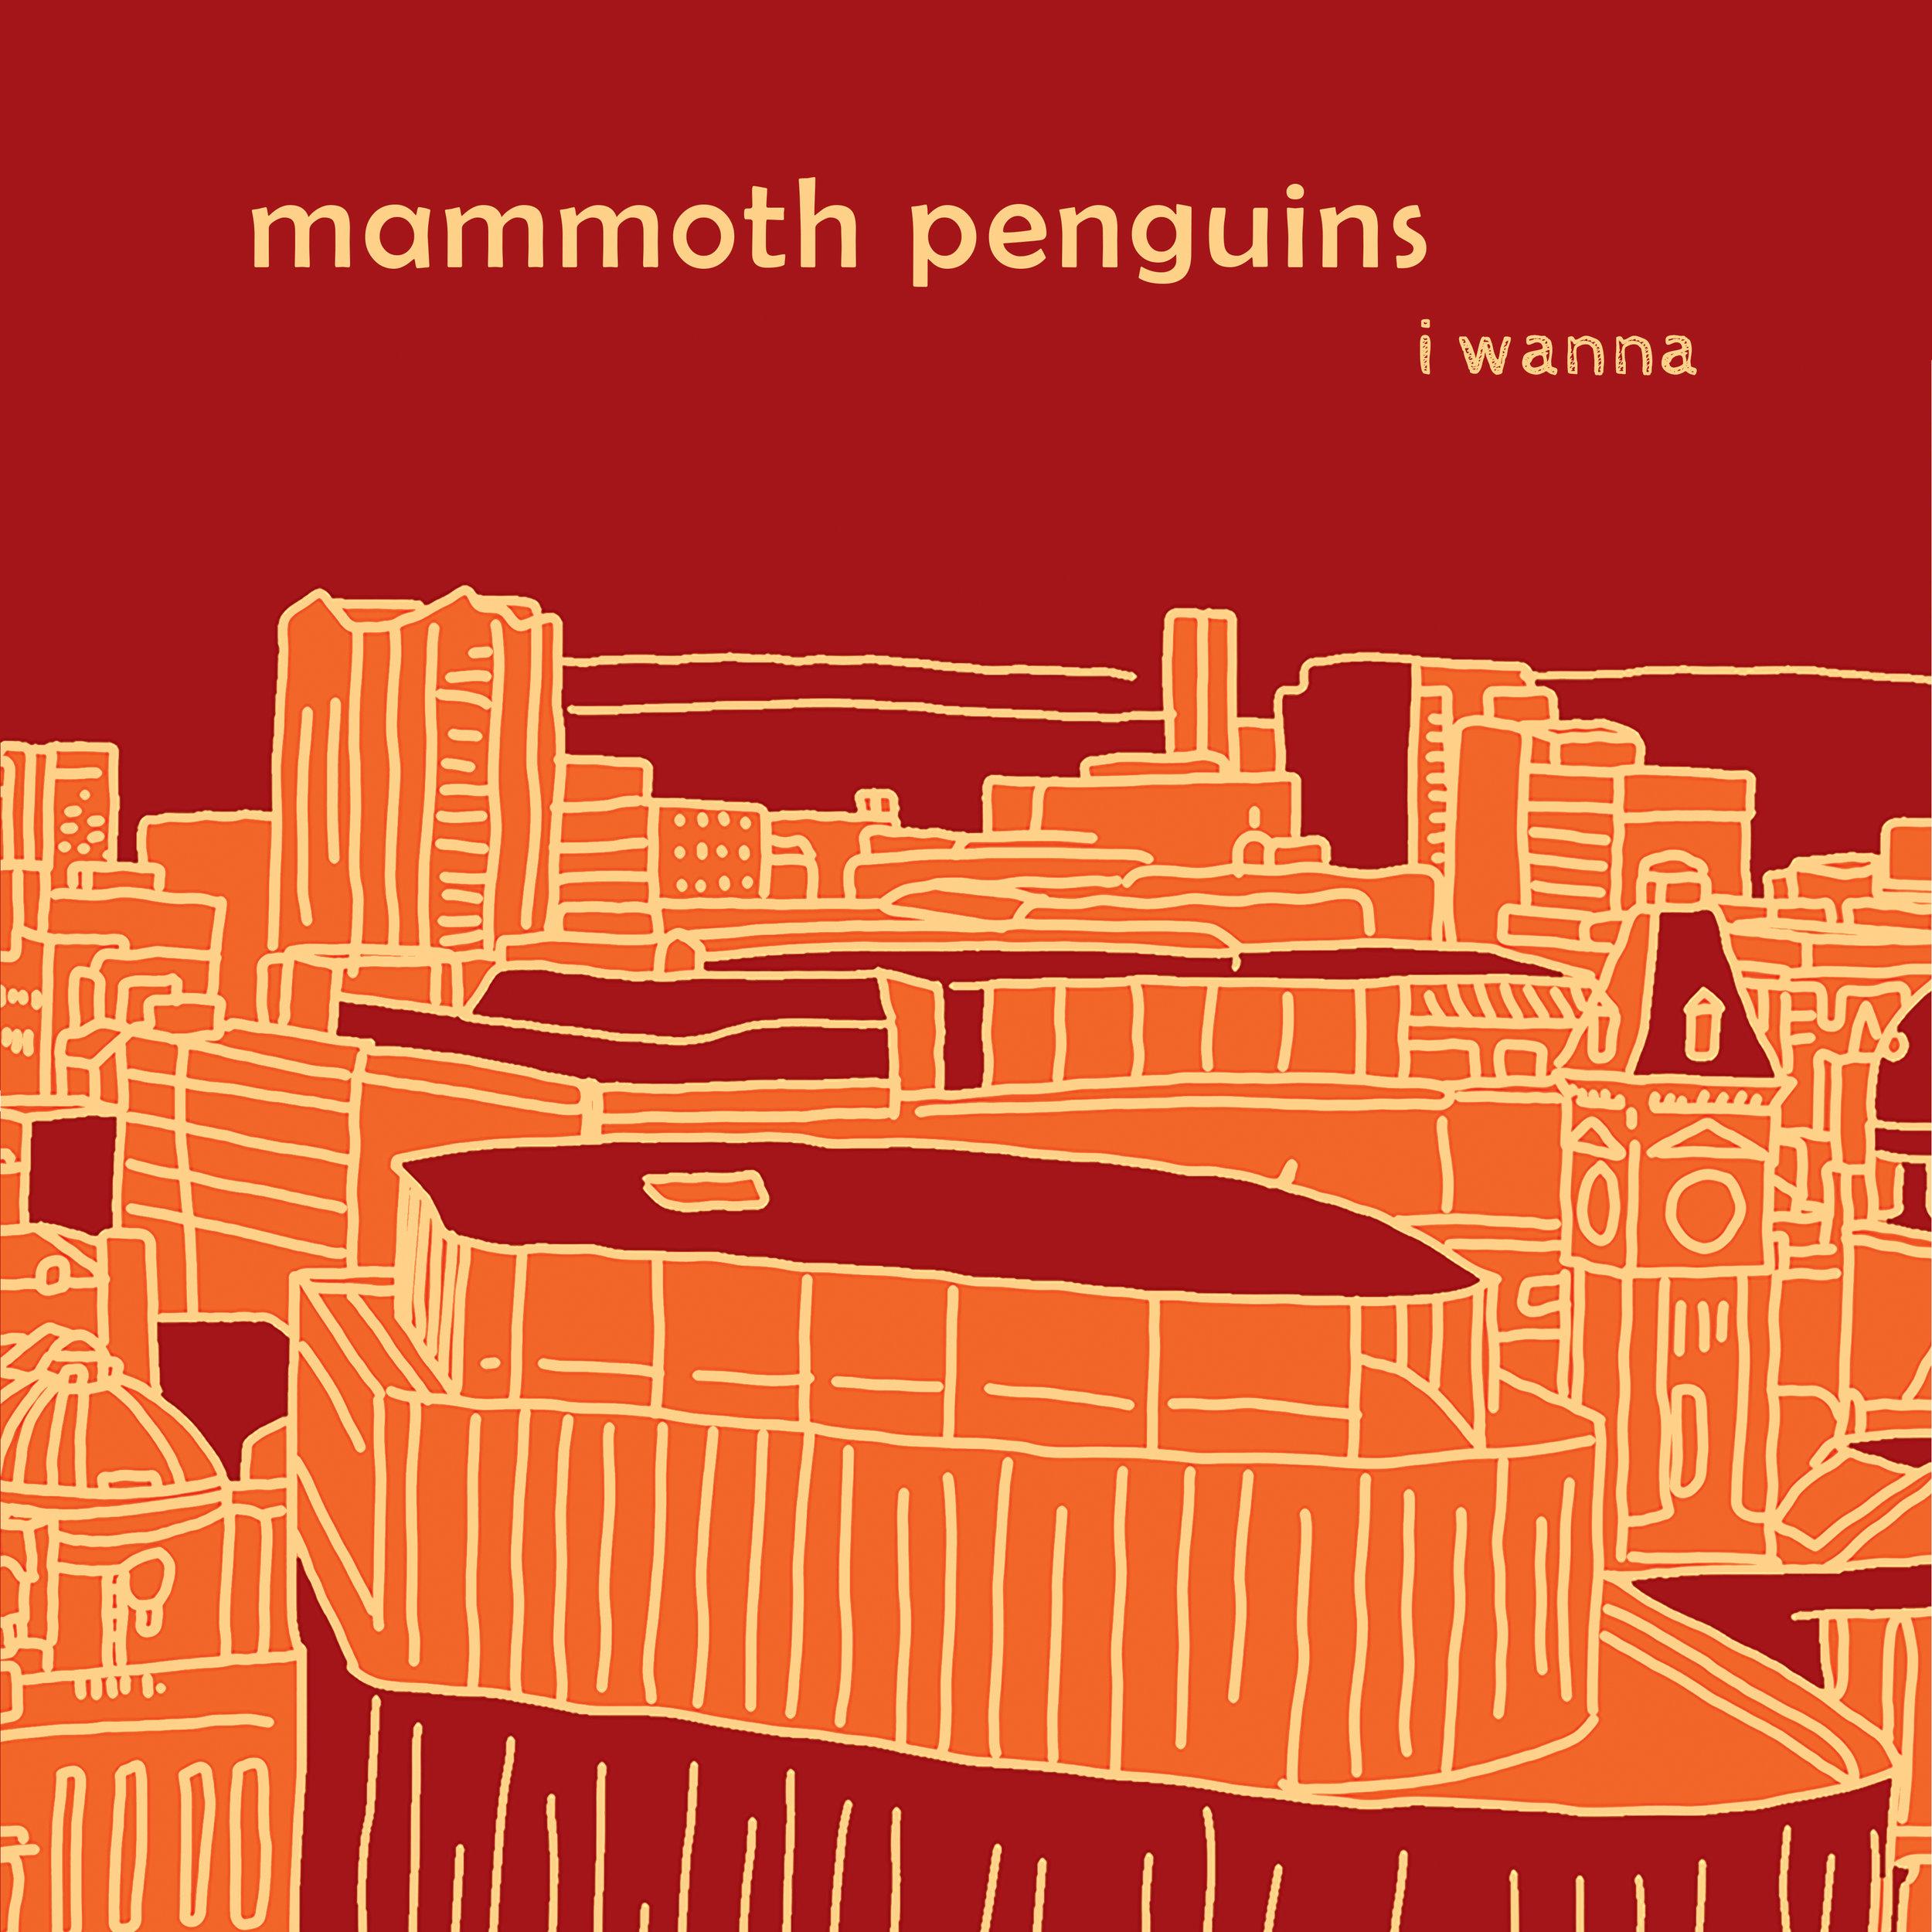 Mammoth Penguins - I Wanna.jpg